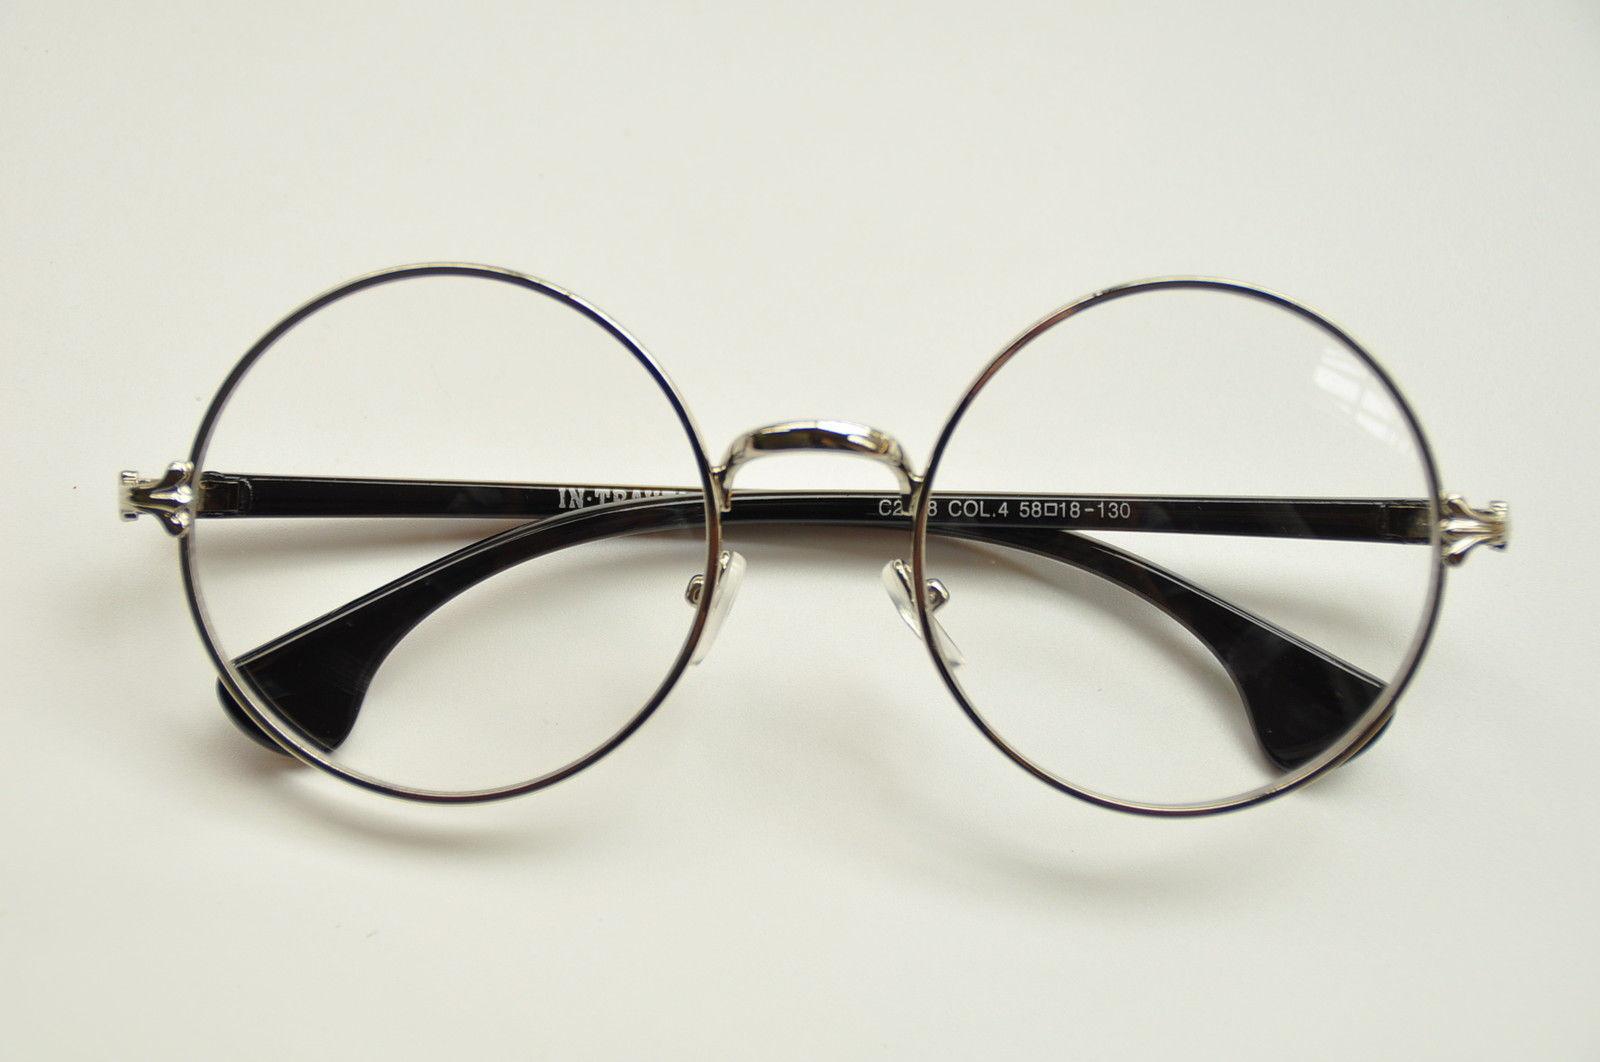 Dallas Green Glasses Frames : YaYa Bay Womens Vintage Bathing